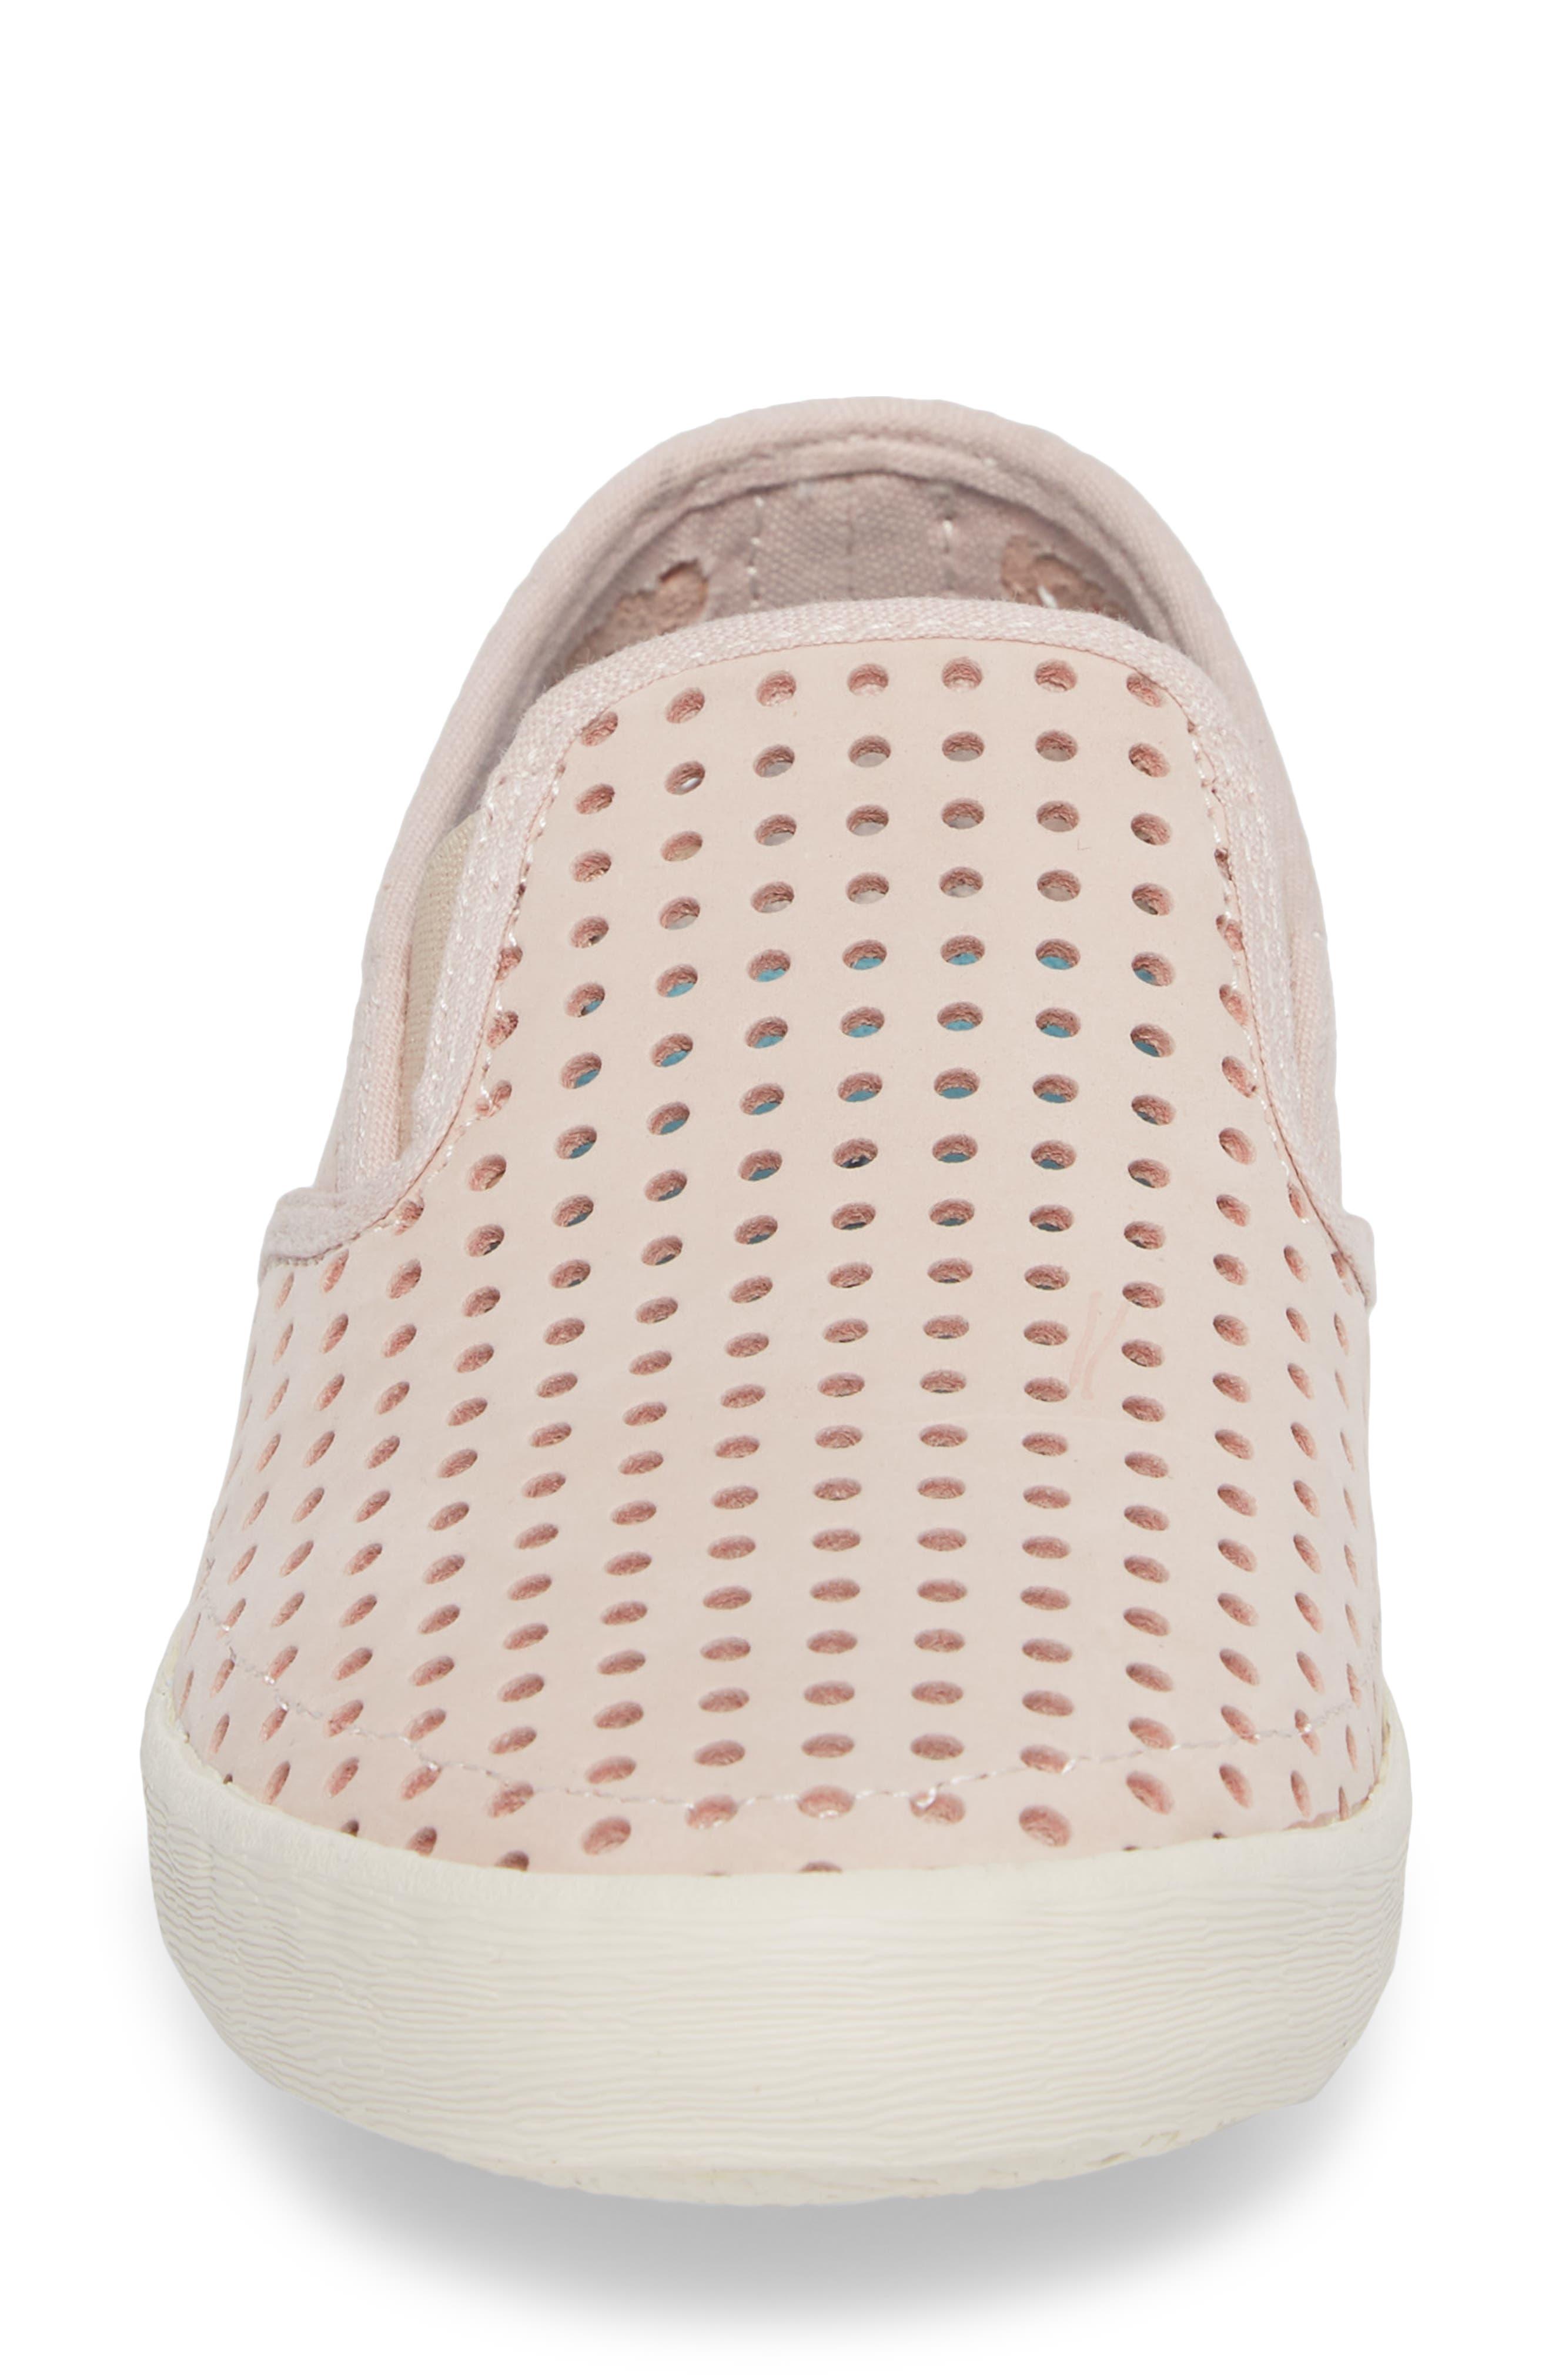 Baja Perforated Slip-On Sneaker,                             Alternate thumbnail 4, color,                             Rose Quartz